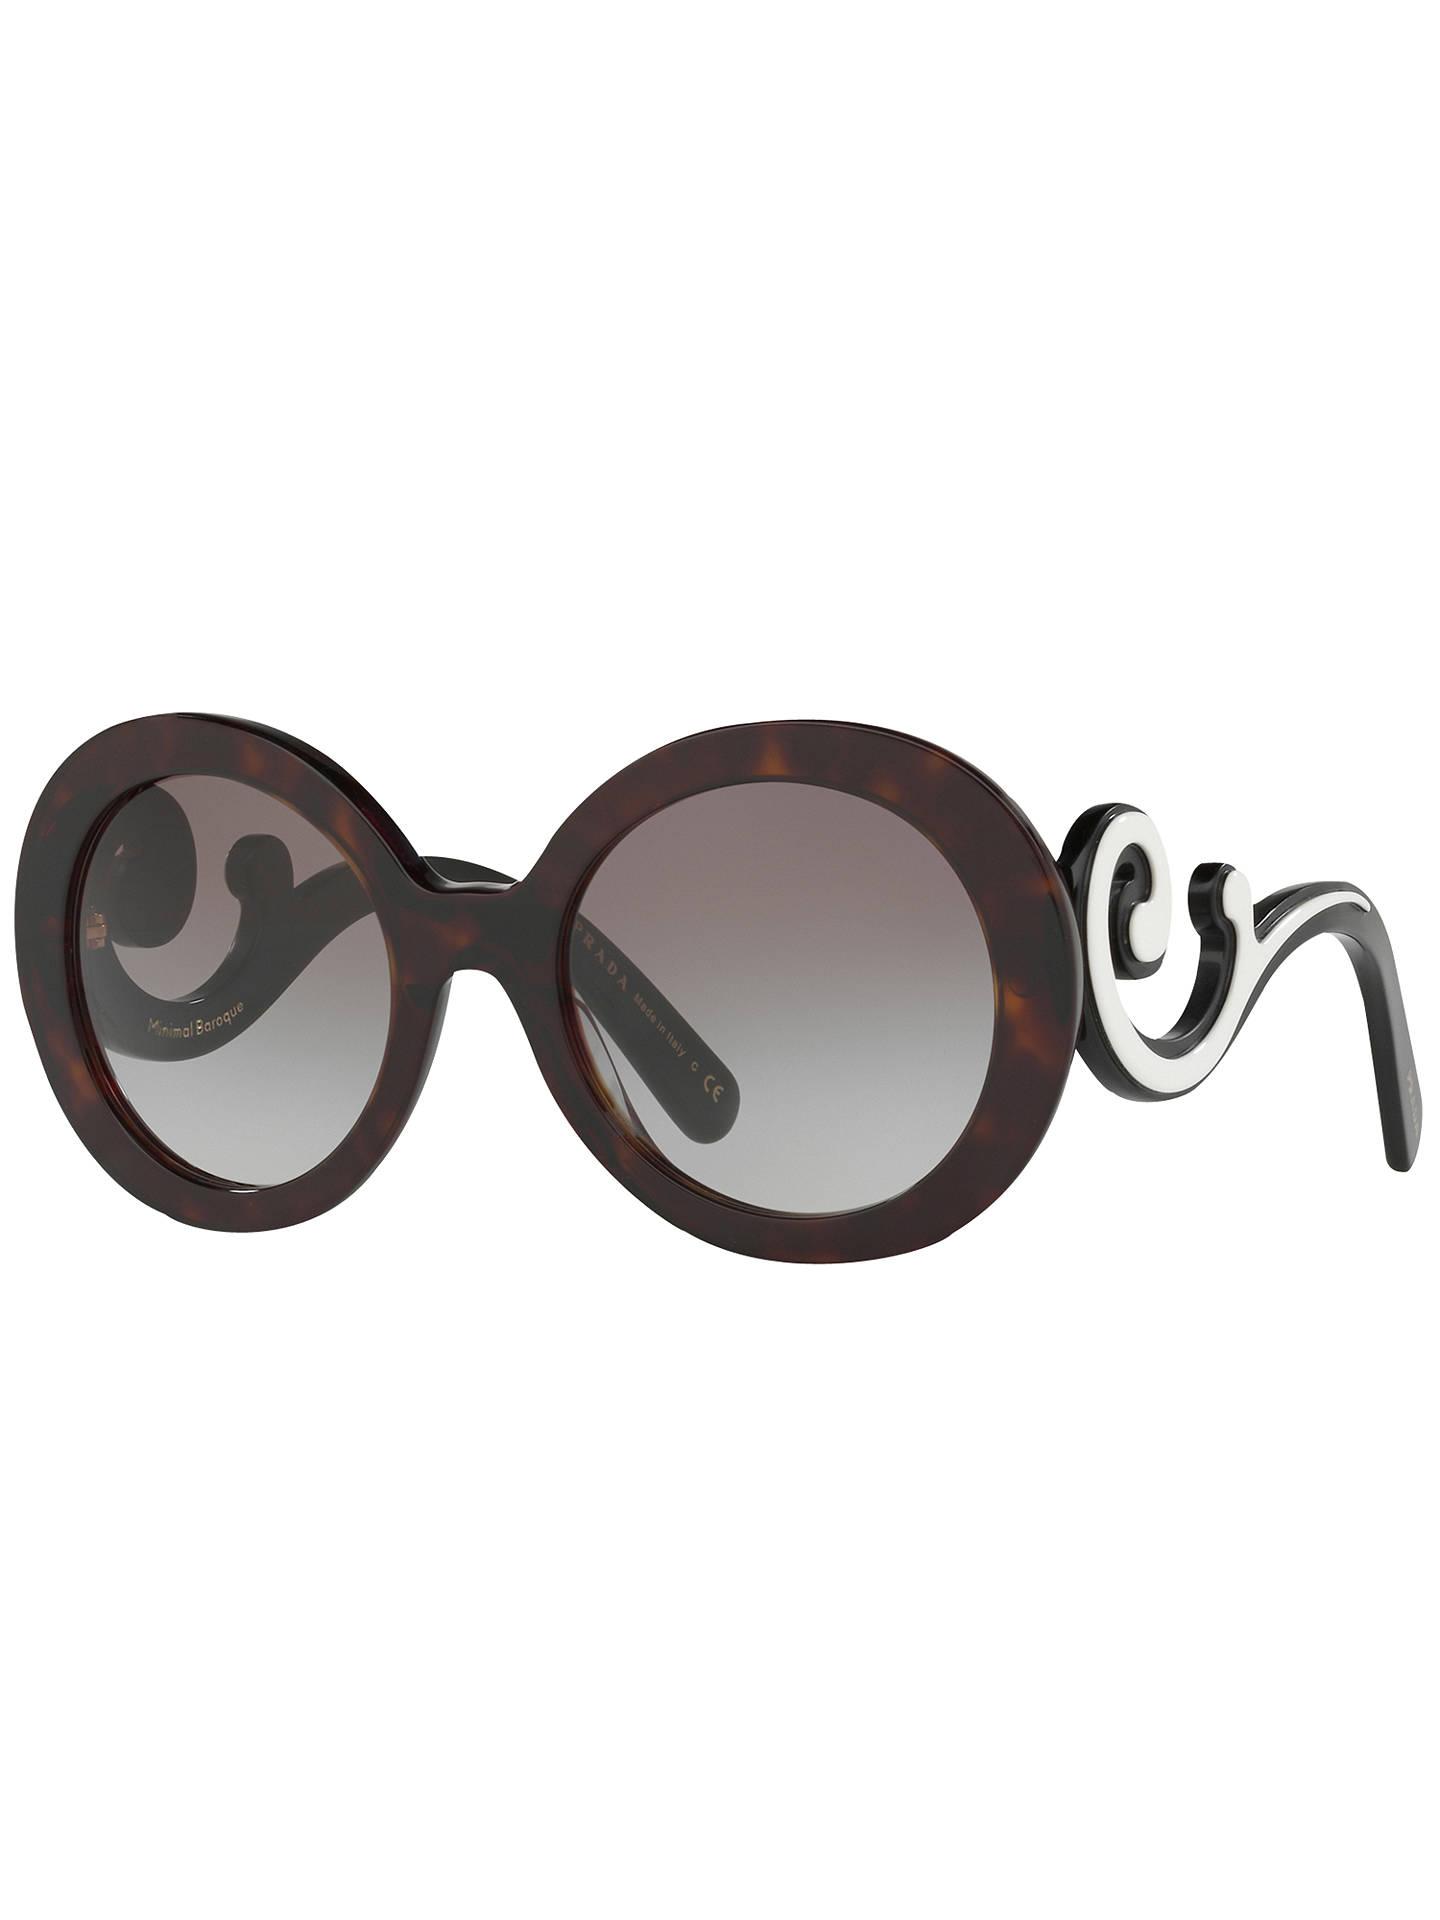 550b6487c9f6 Buy Prada PR 08TS Minimal Baroque Round Sunglasses, Tortoise/Grey Gradient  Online at johnlewis ...